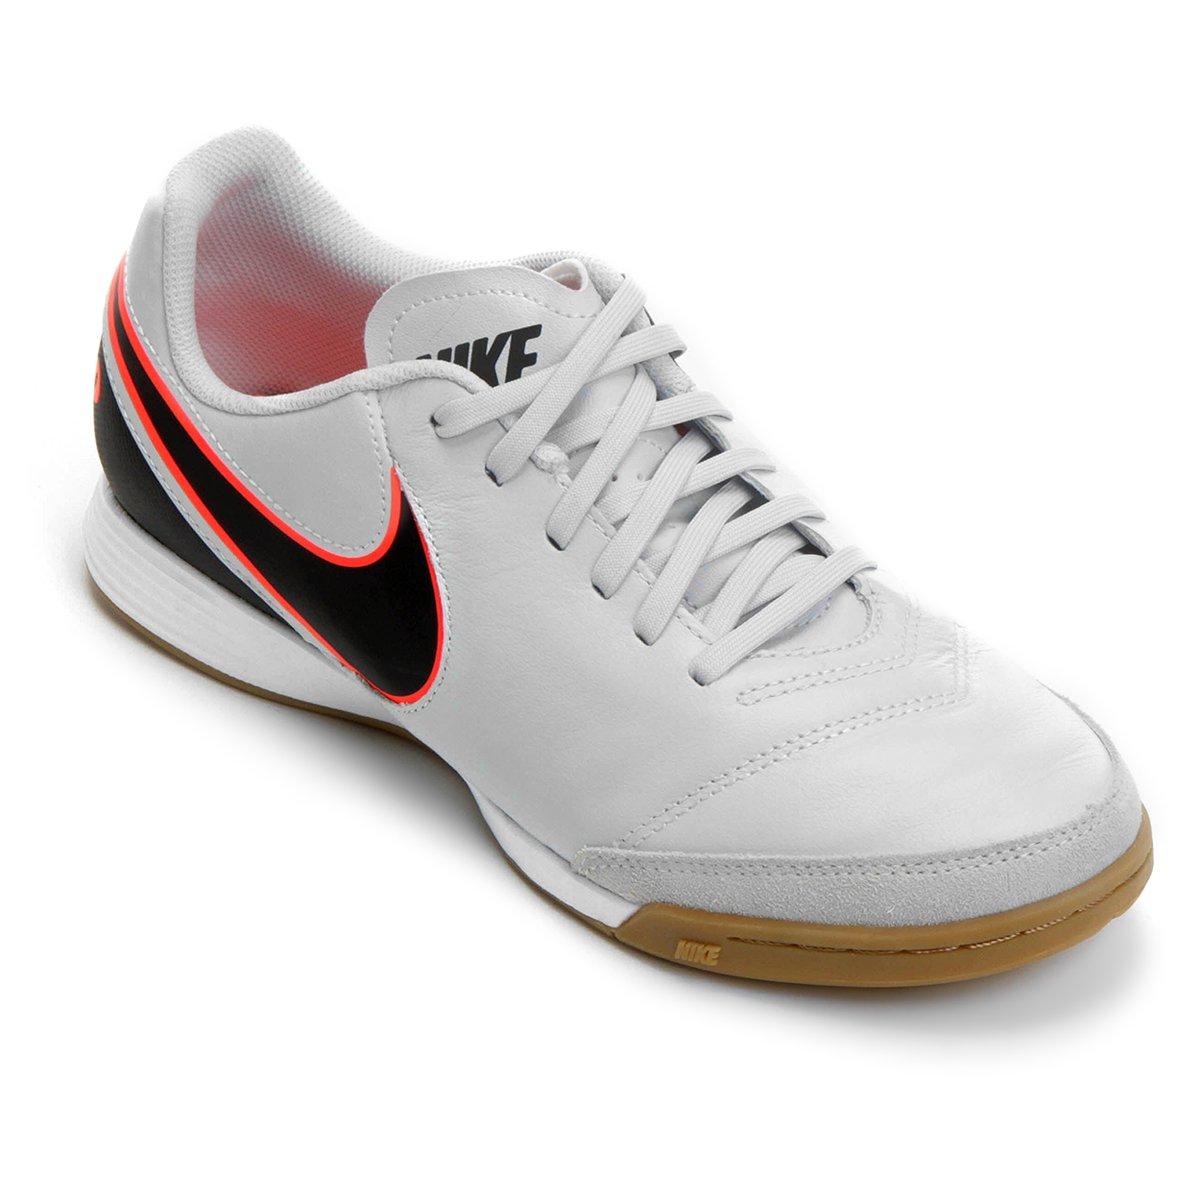 Chuteira Futsal Nike Tiempo Genio 2 Leather IC Masculina - Compre Agora  c0d398704f897